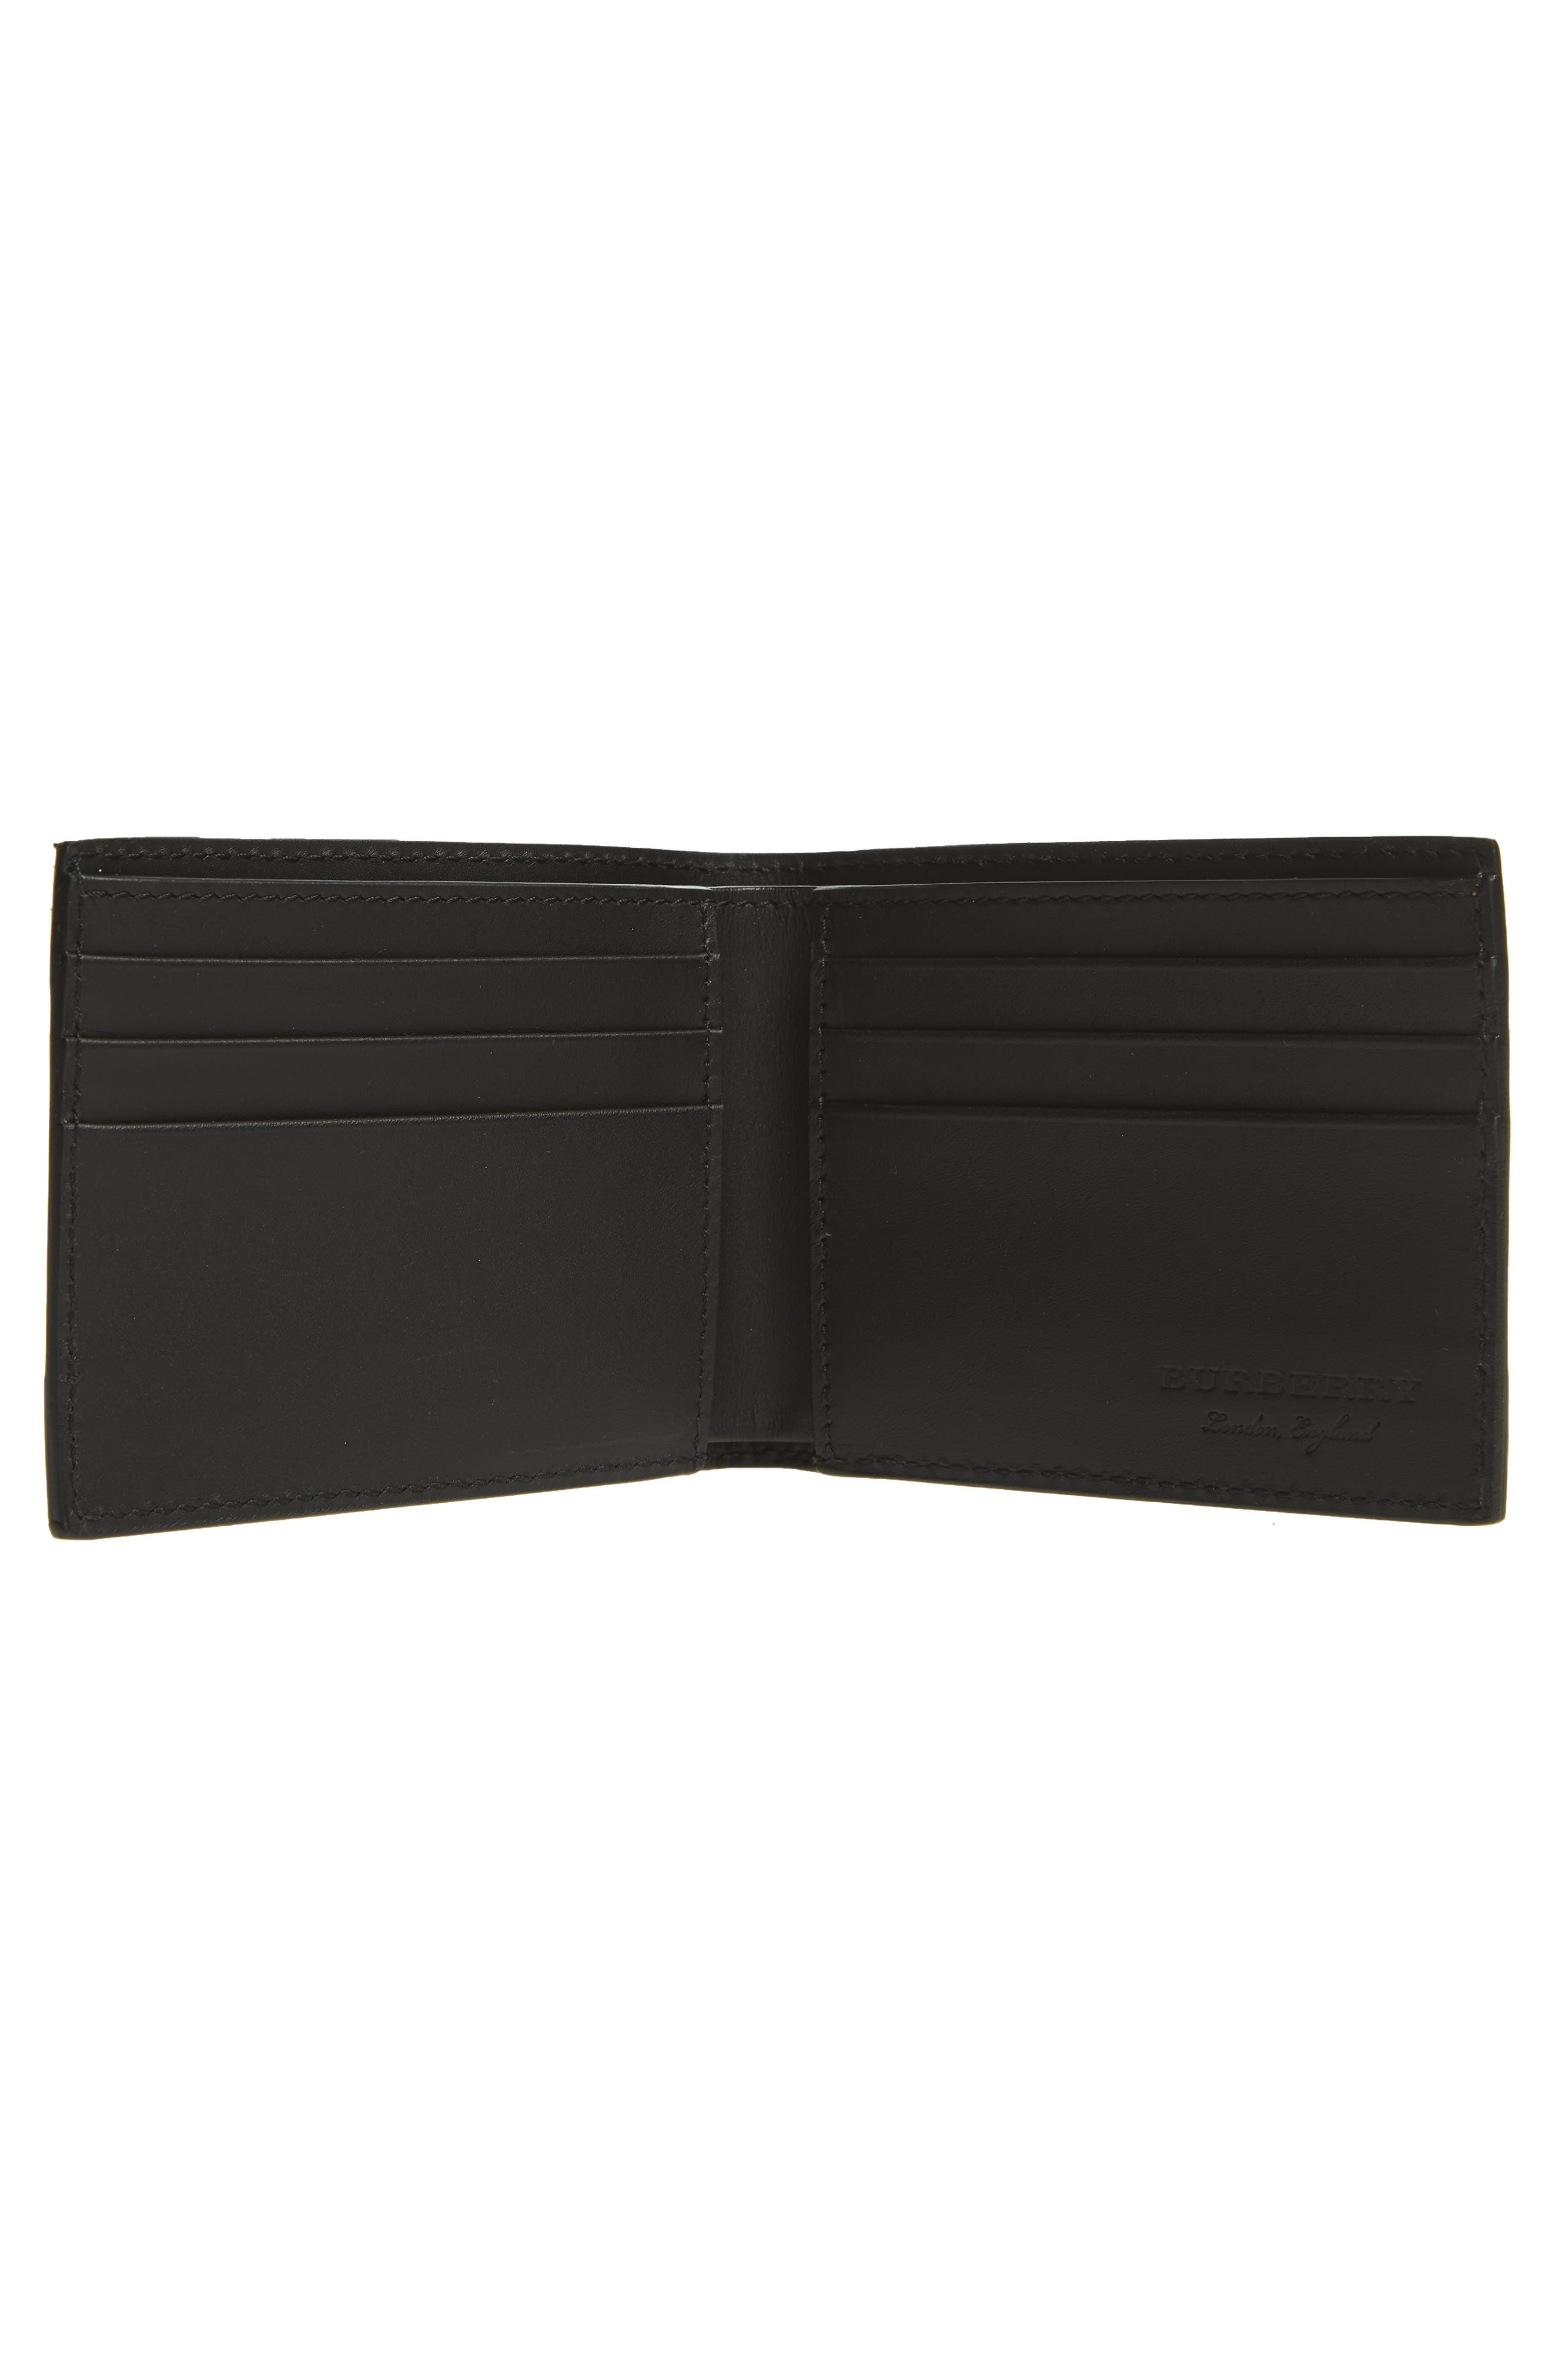 Haymarket Bifold Wallet,                             Alternate thumbnail 2, color,                             Black